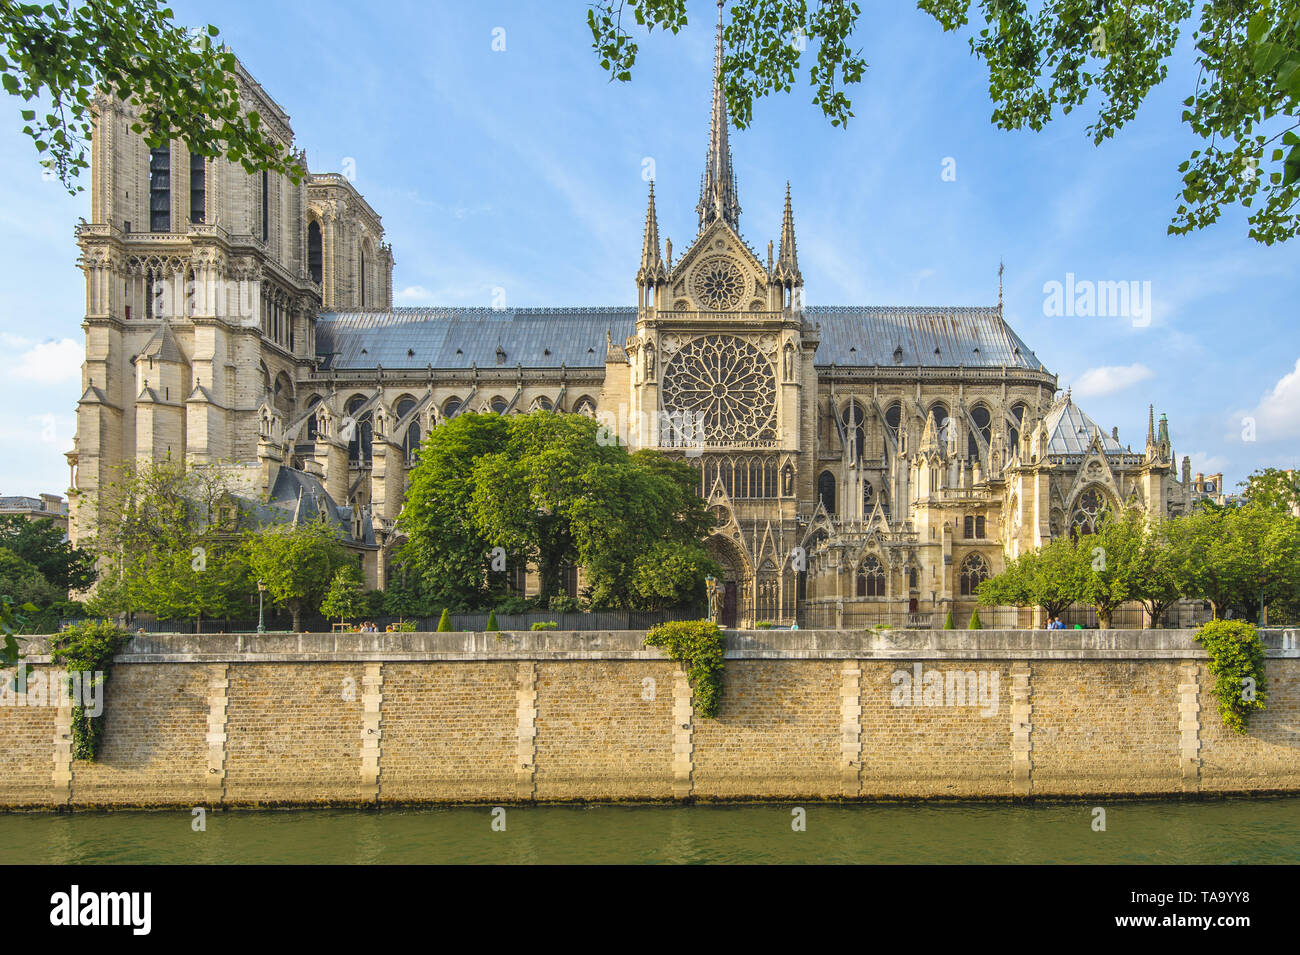 Notre Dame de Paris Cathedral and Seine River - Stock Image